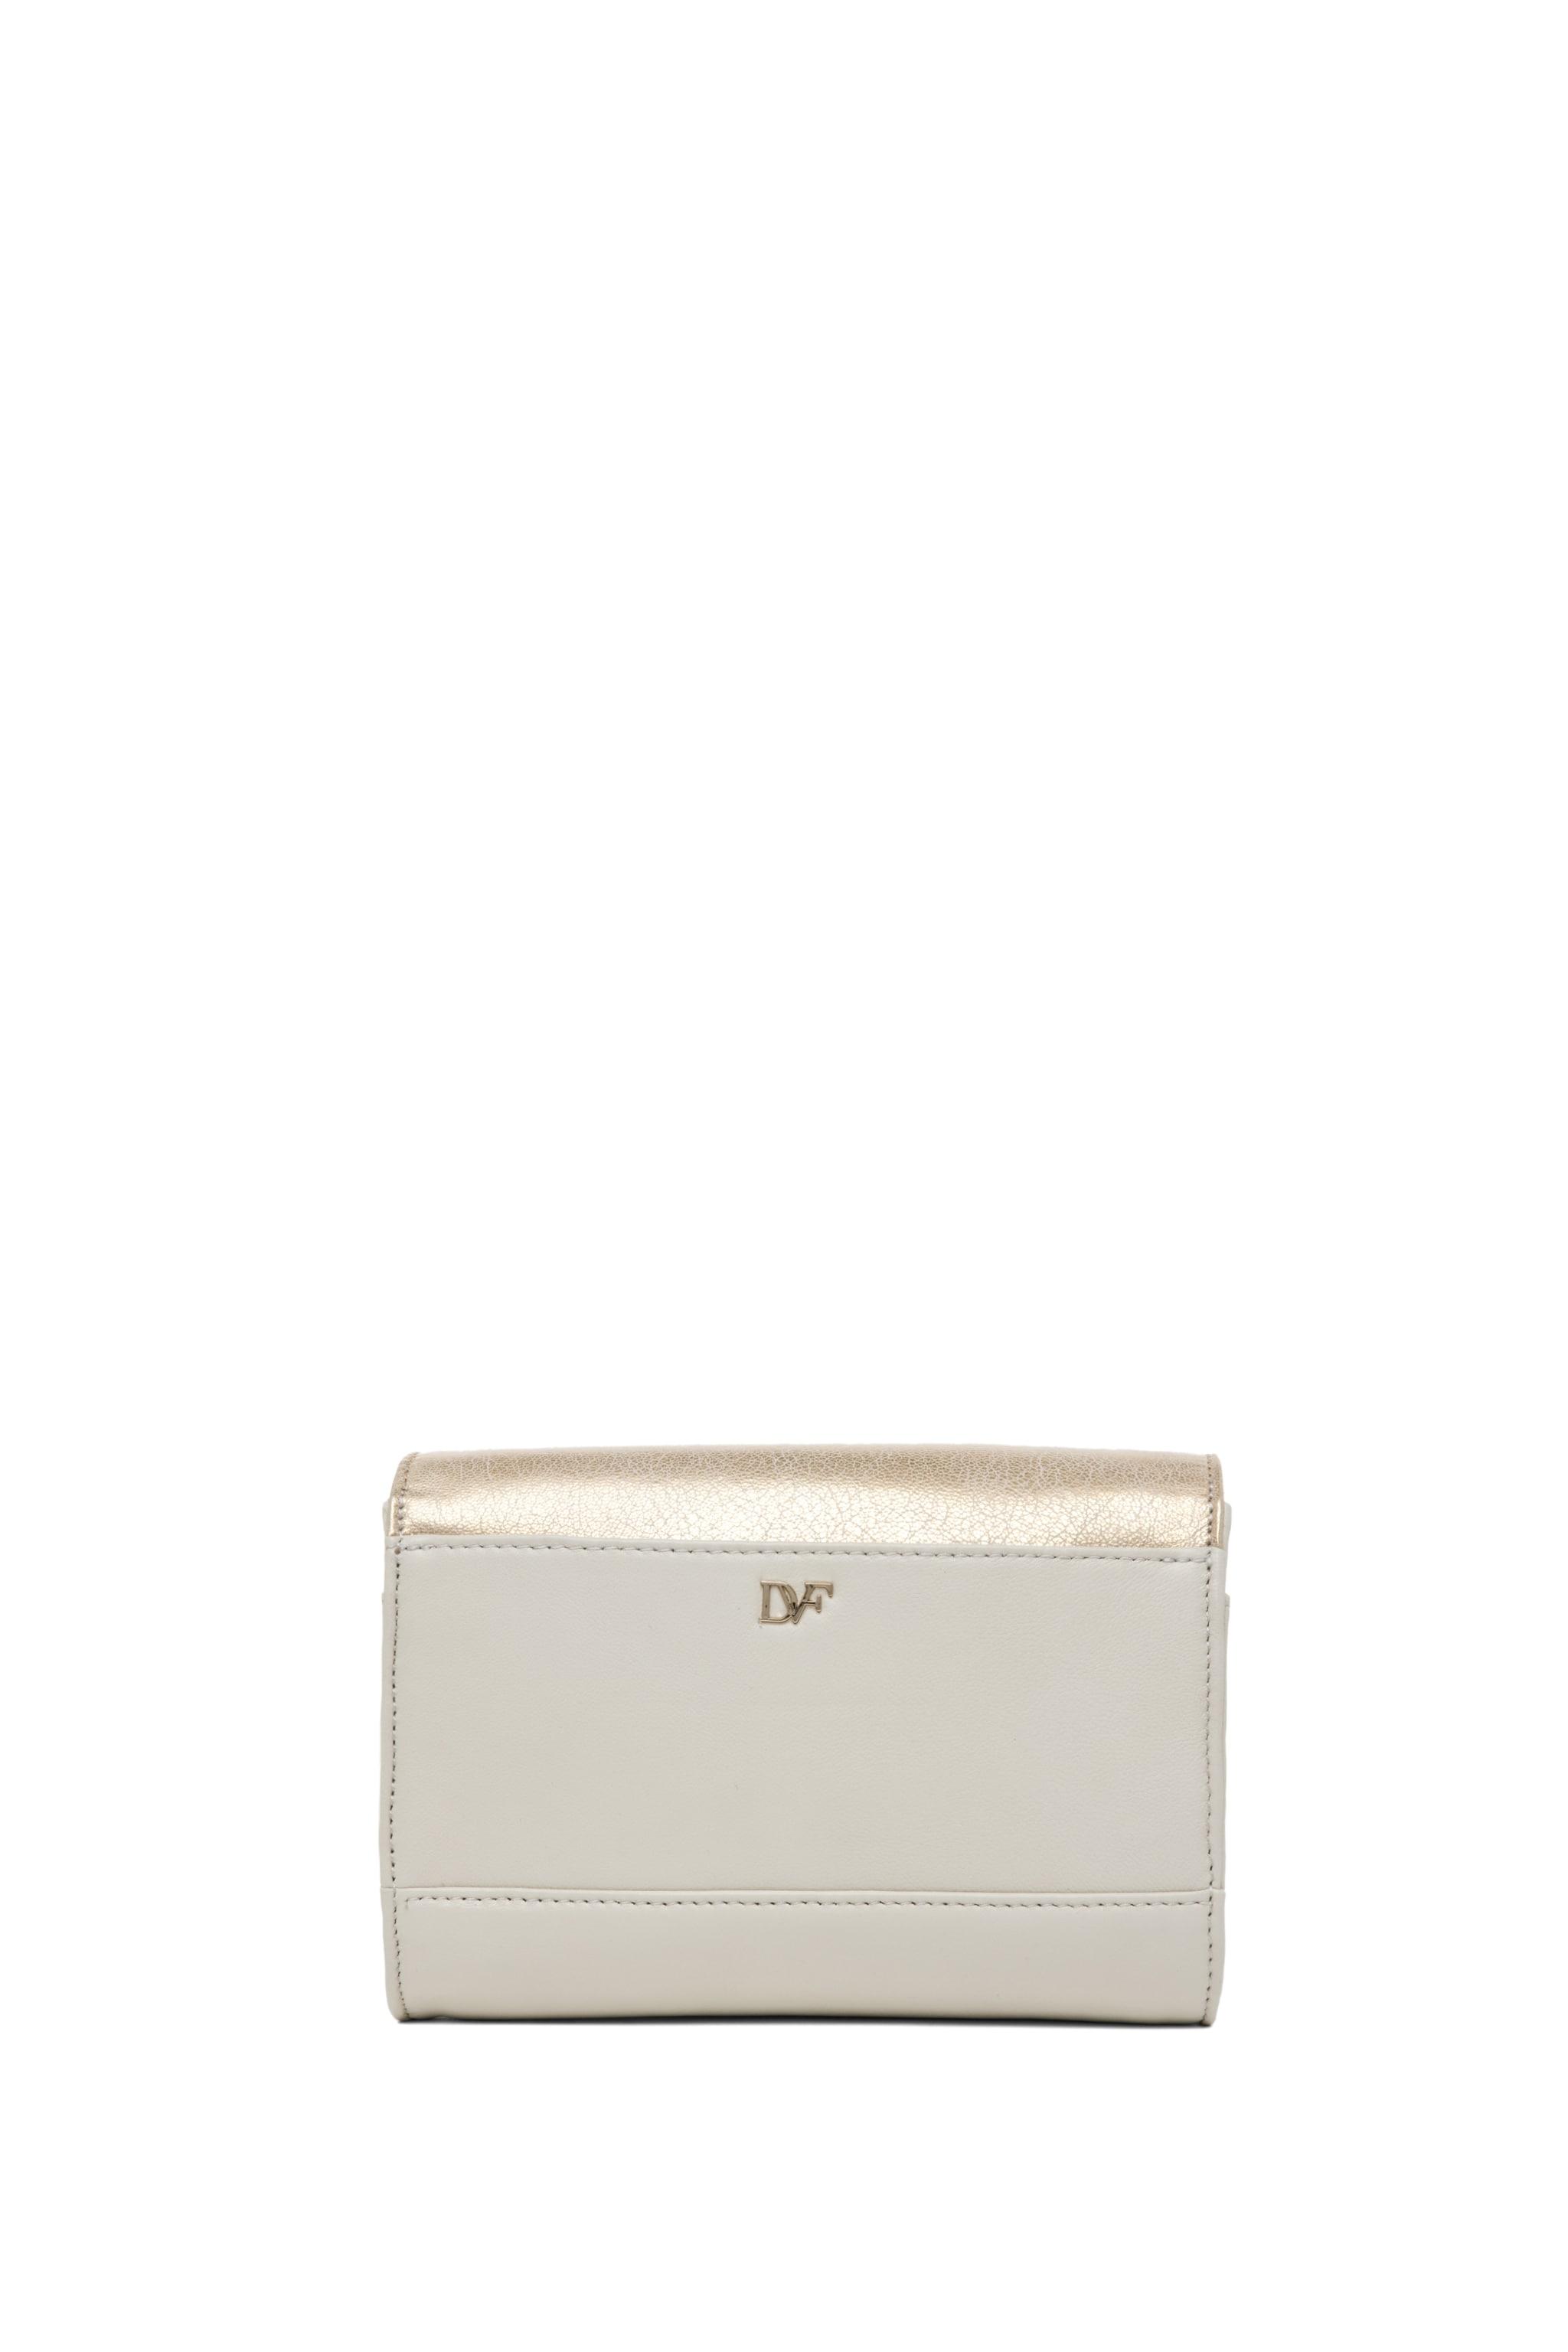 Image 2 of Diane von Furstenberg Lips Mini Soft Metallic in Light Gold